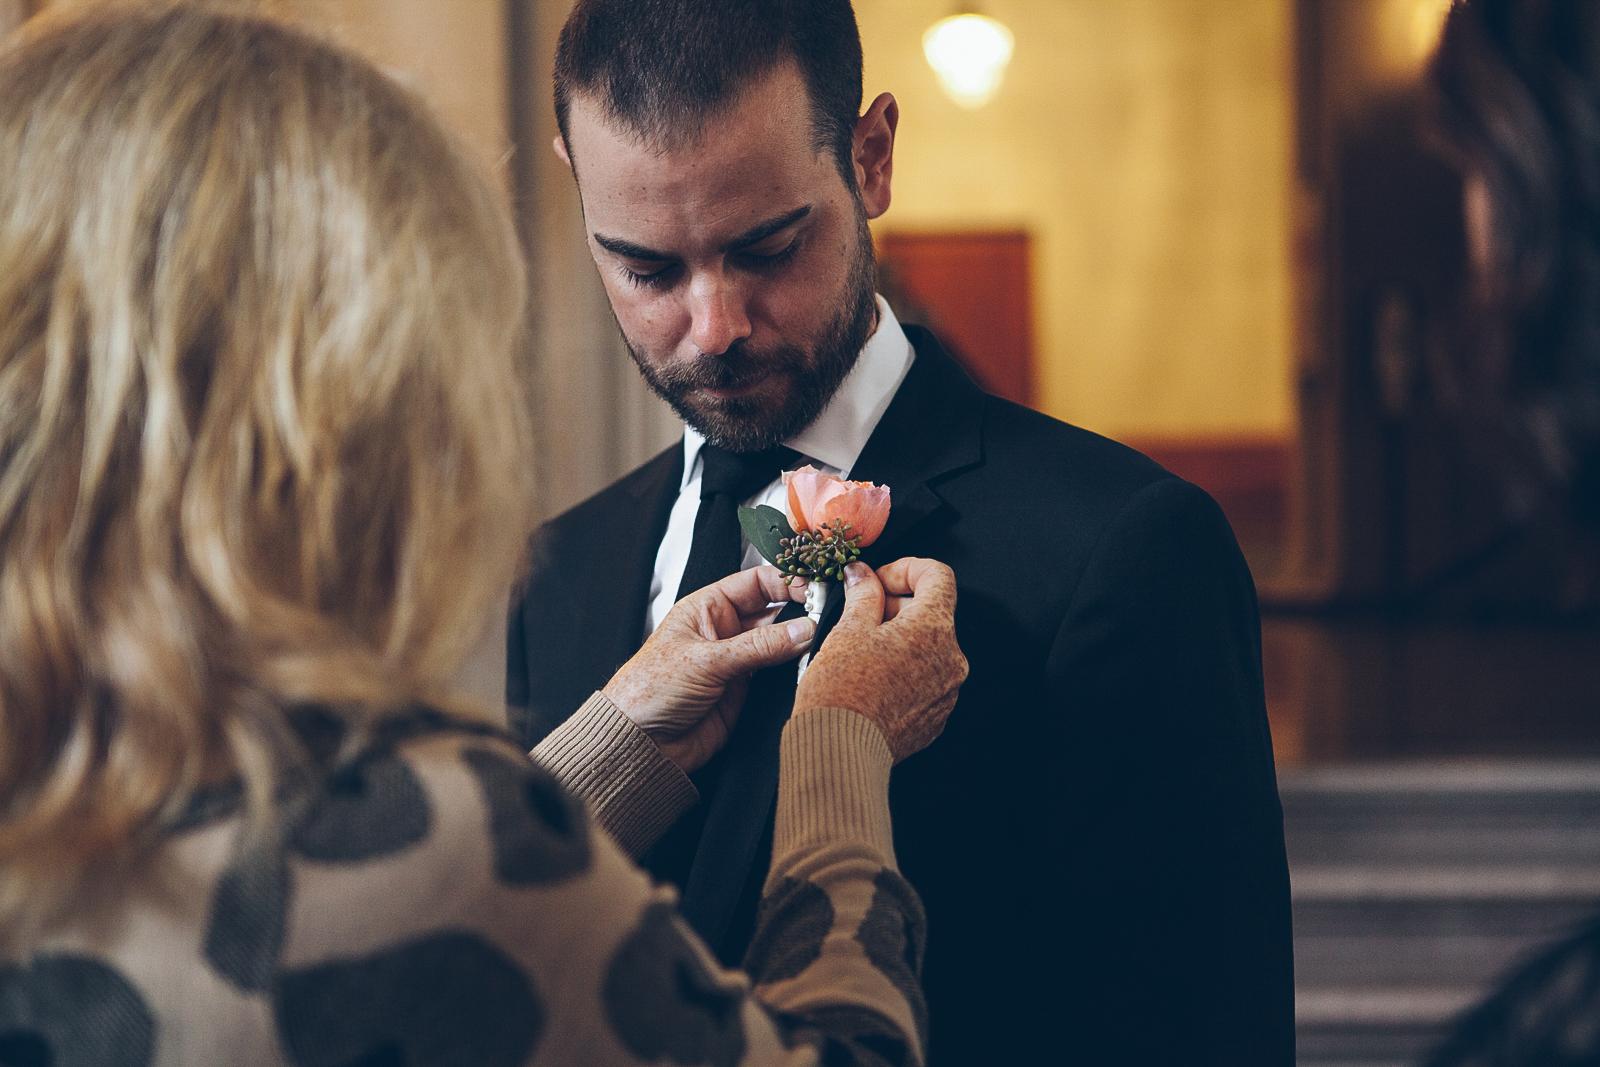 San_francisco_city_hall_wedding_photography_meegan_travis_ebony_siovhan_bokeh_photography_06.jpg